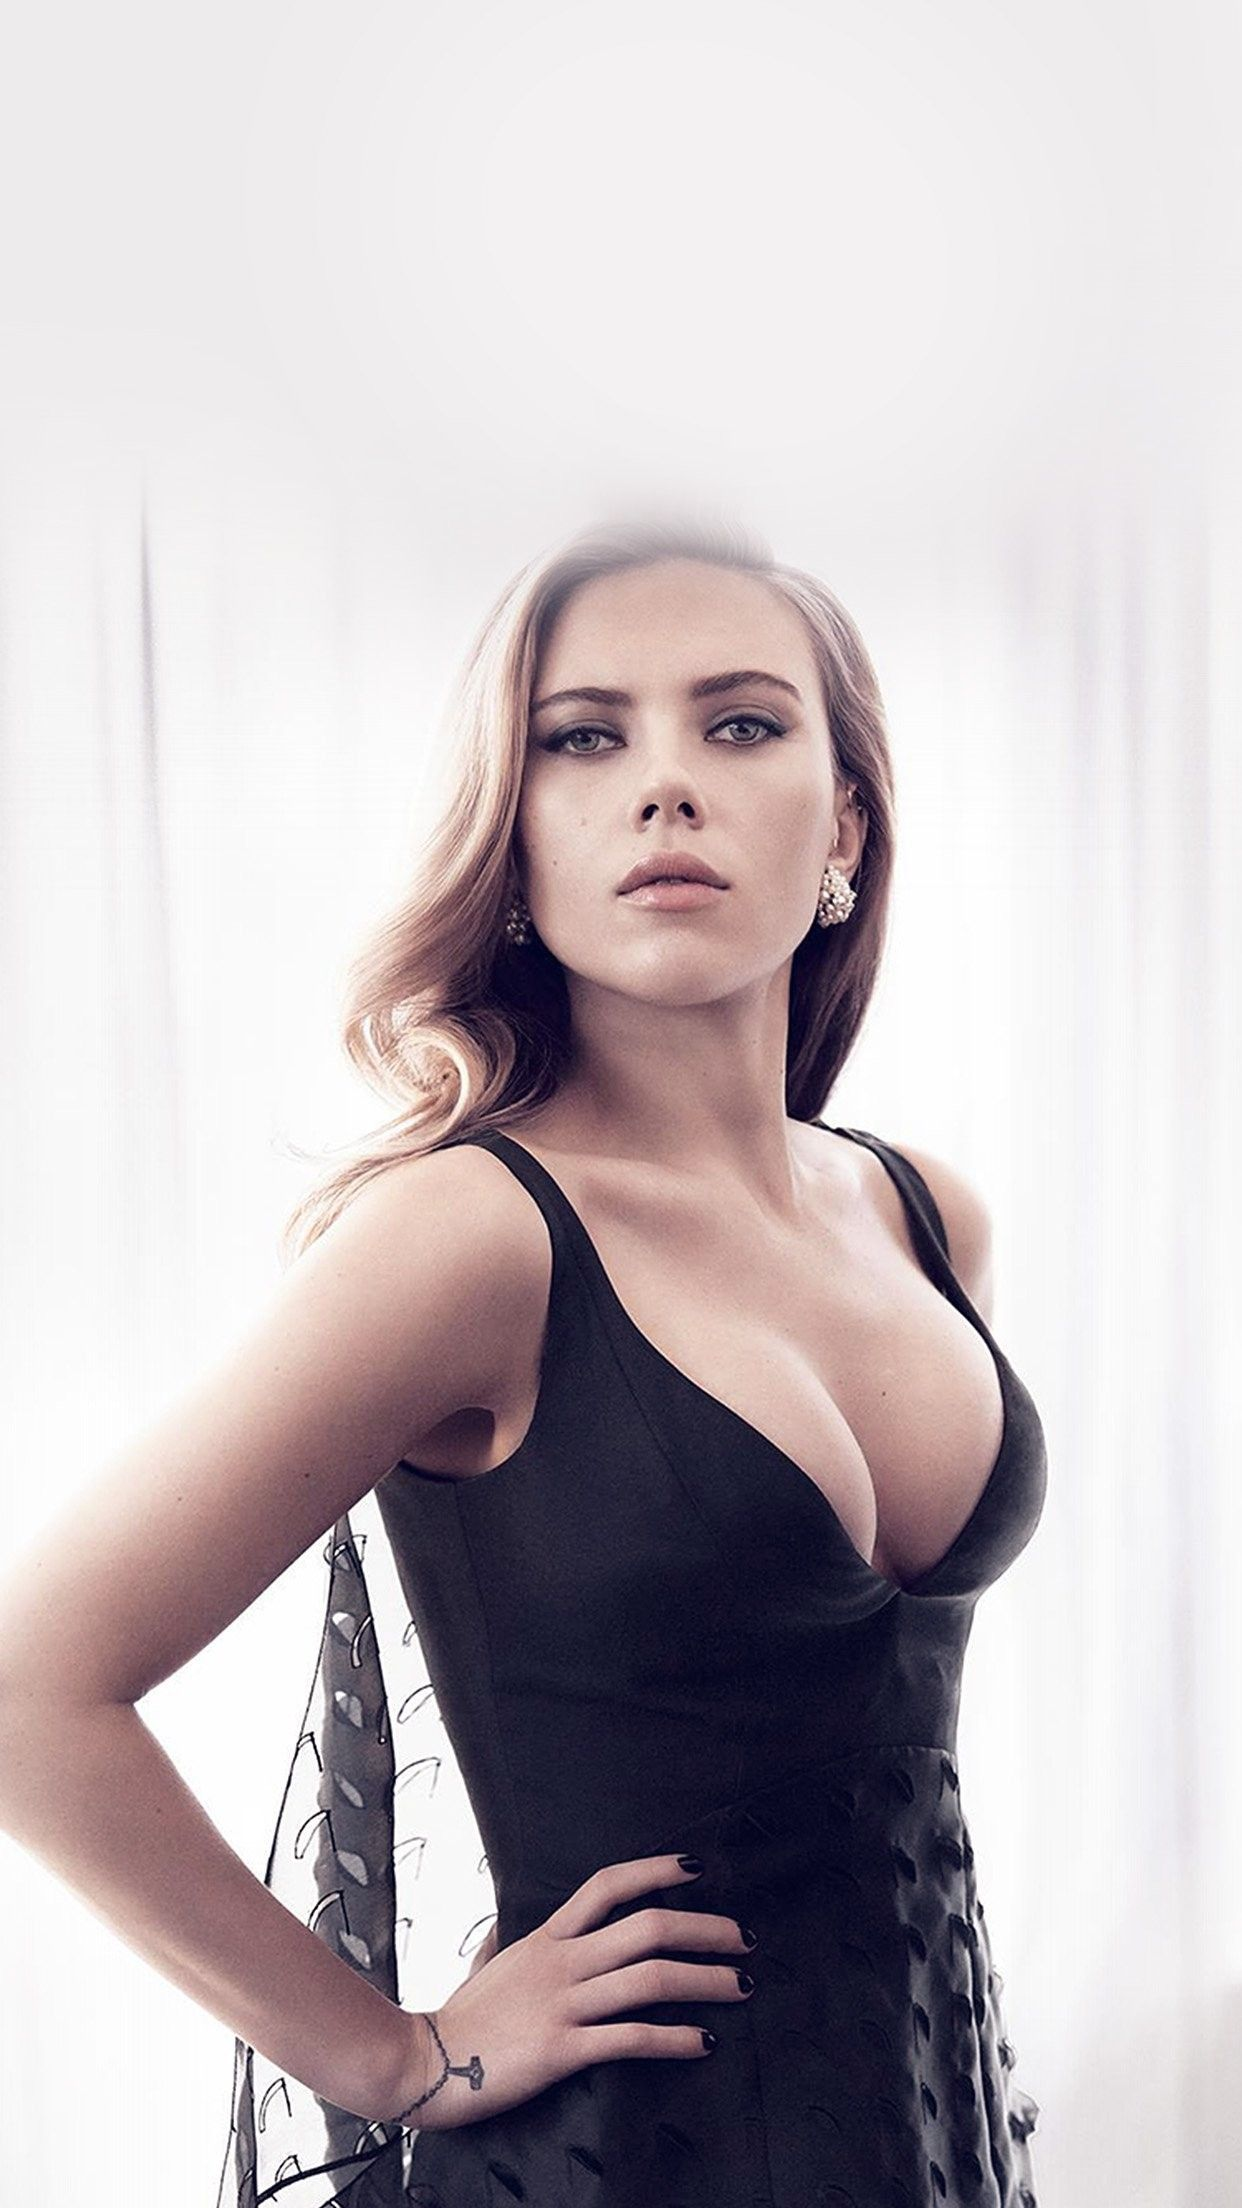 Pin by Klaus on Klaus in 2020 Girl film, Scarlett